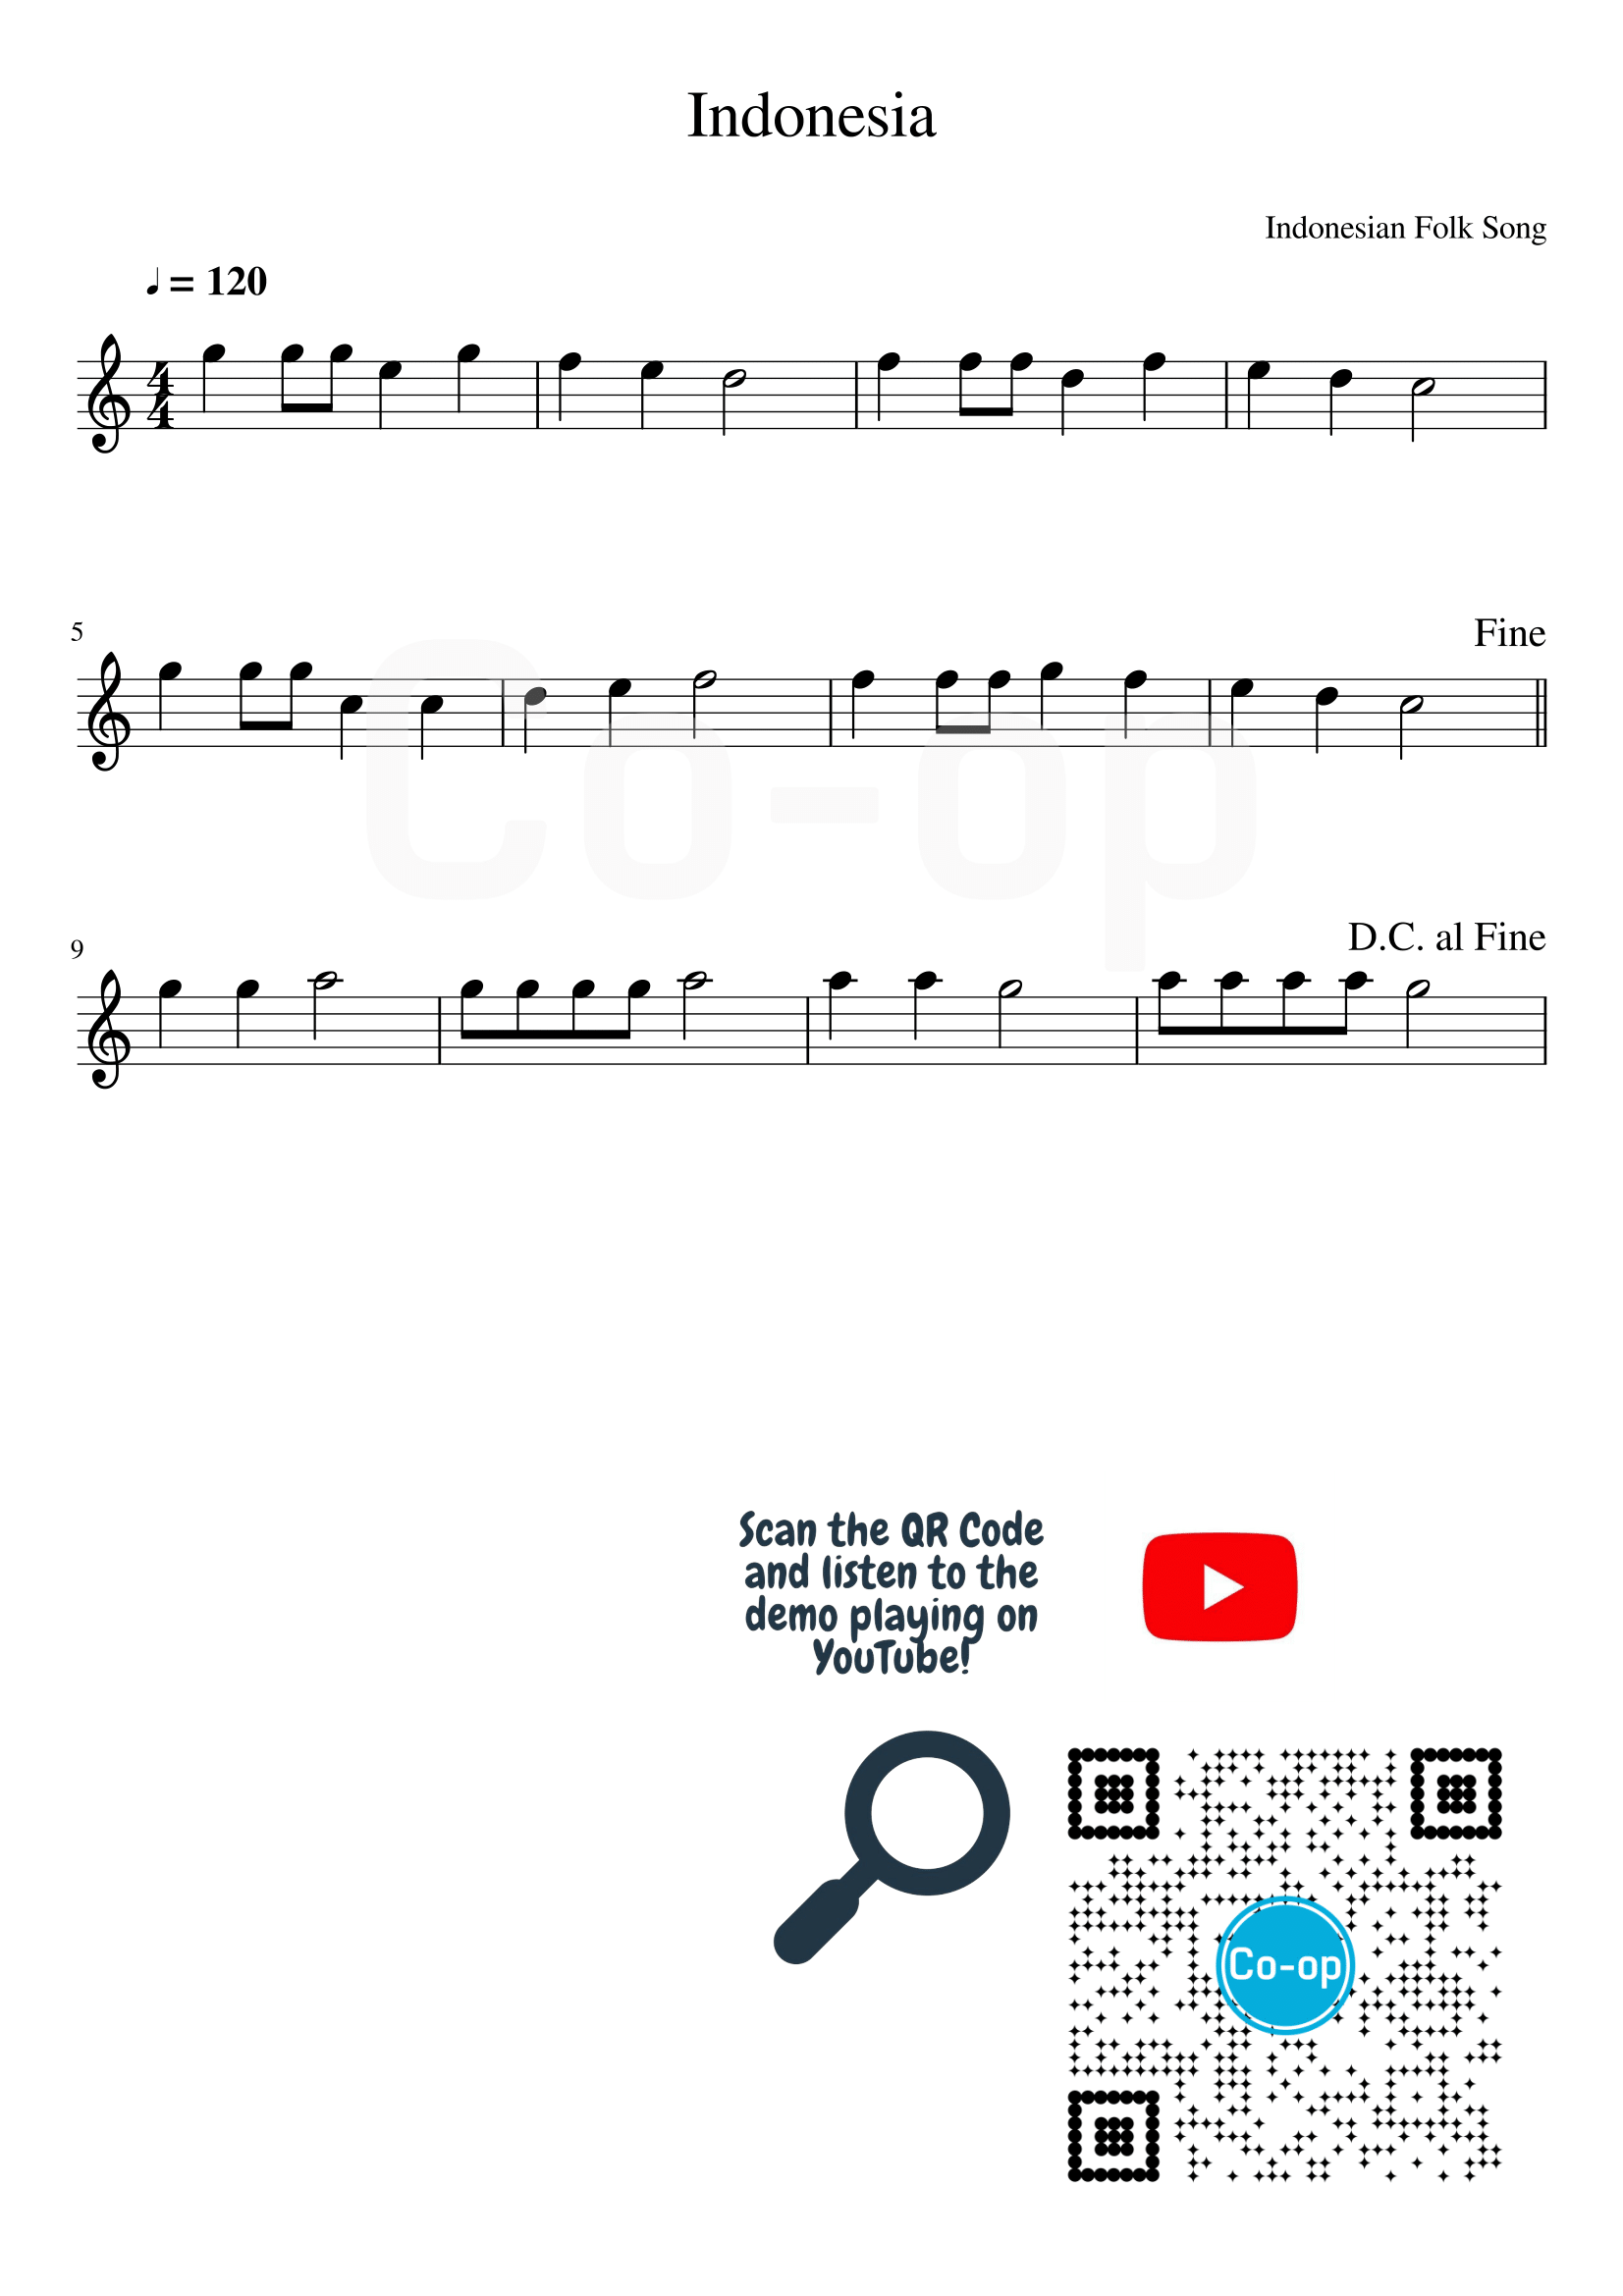 Indonesia | Staff Notation | Free Sheet Music